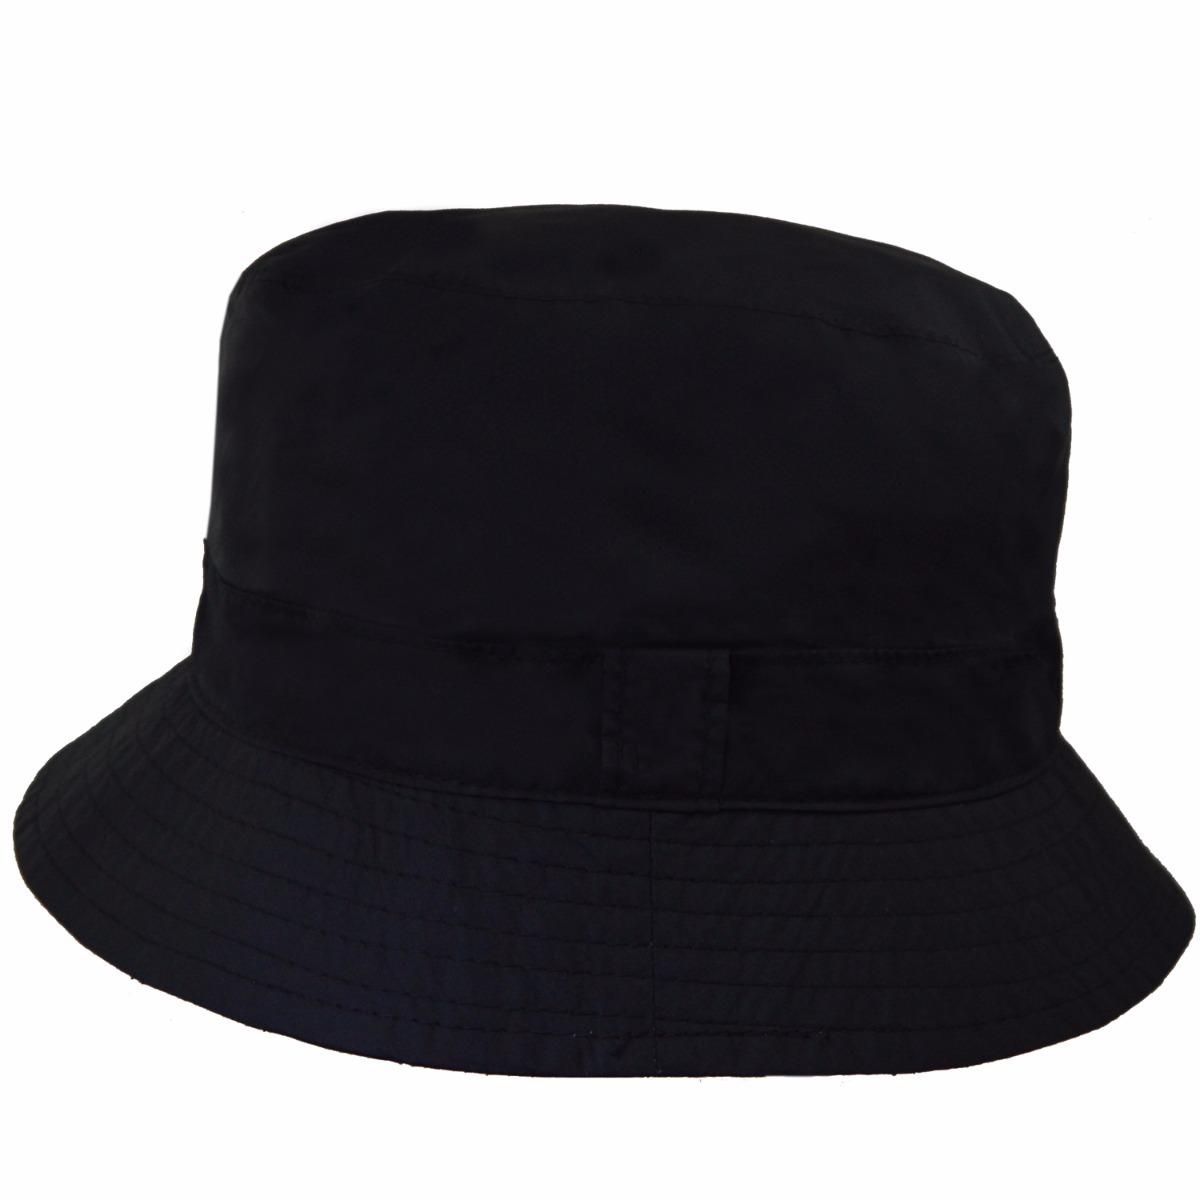 sombrero human sarge lluvia compañia de sombreros 712202. Cargando zoom. 2d1931397371